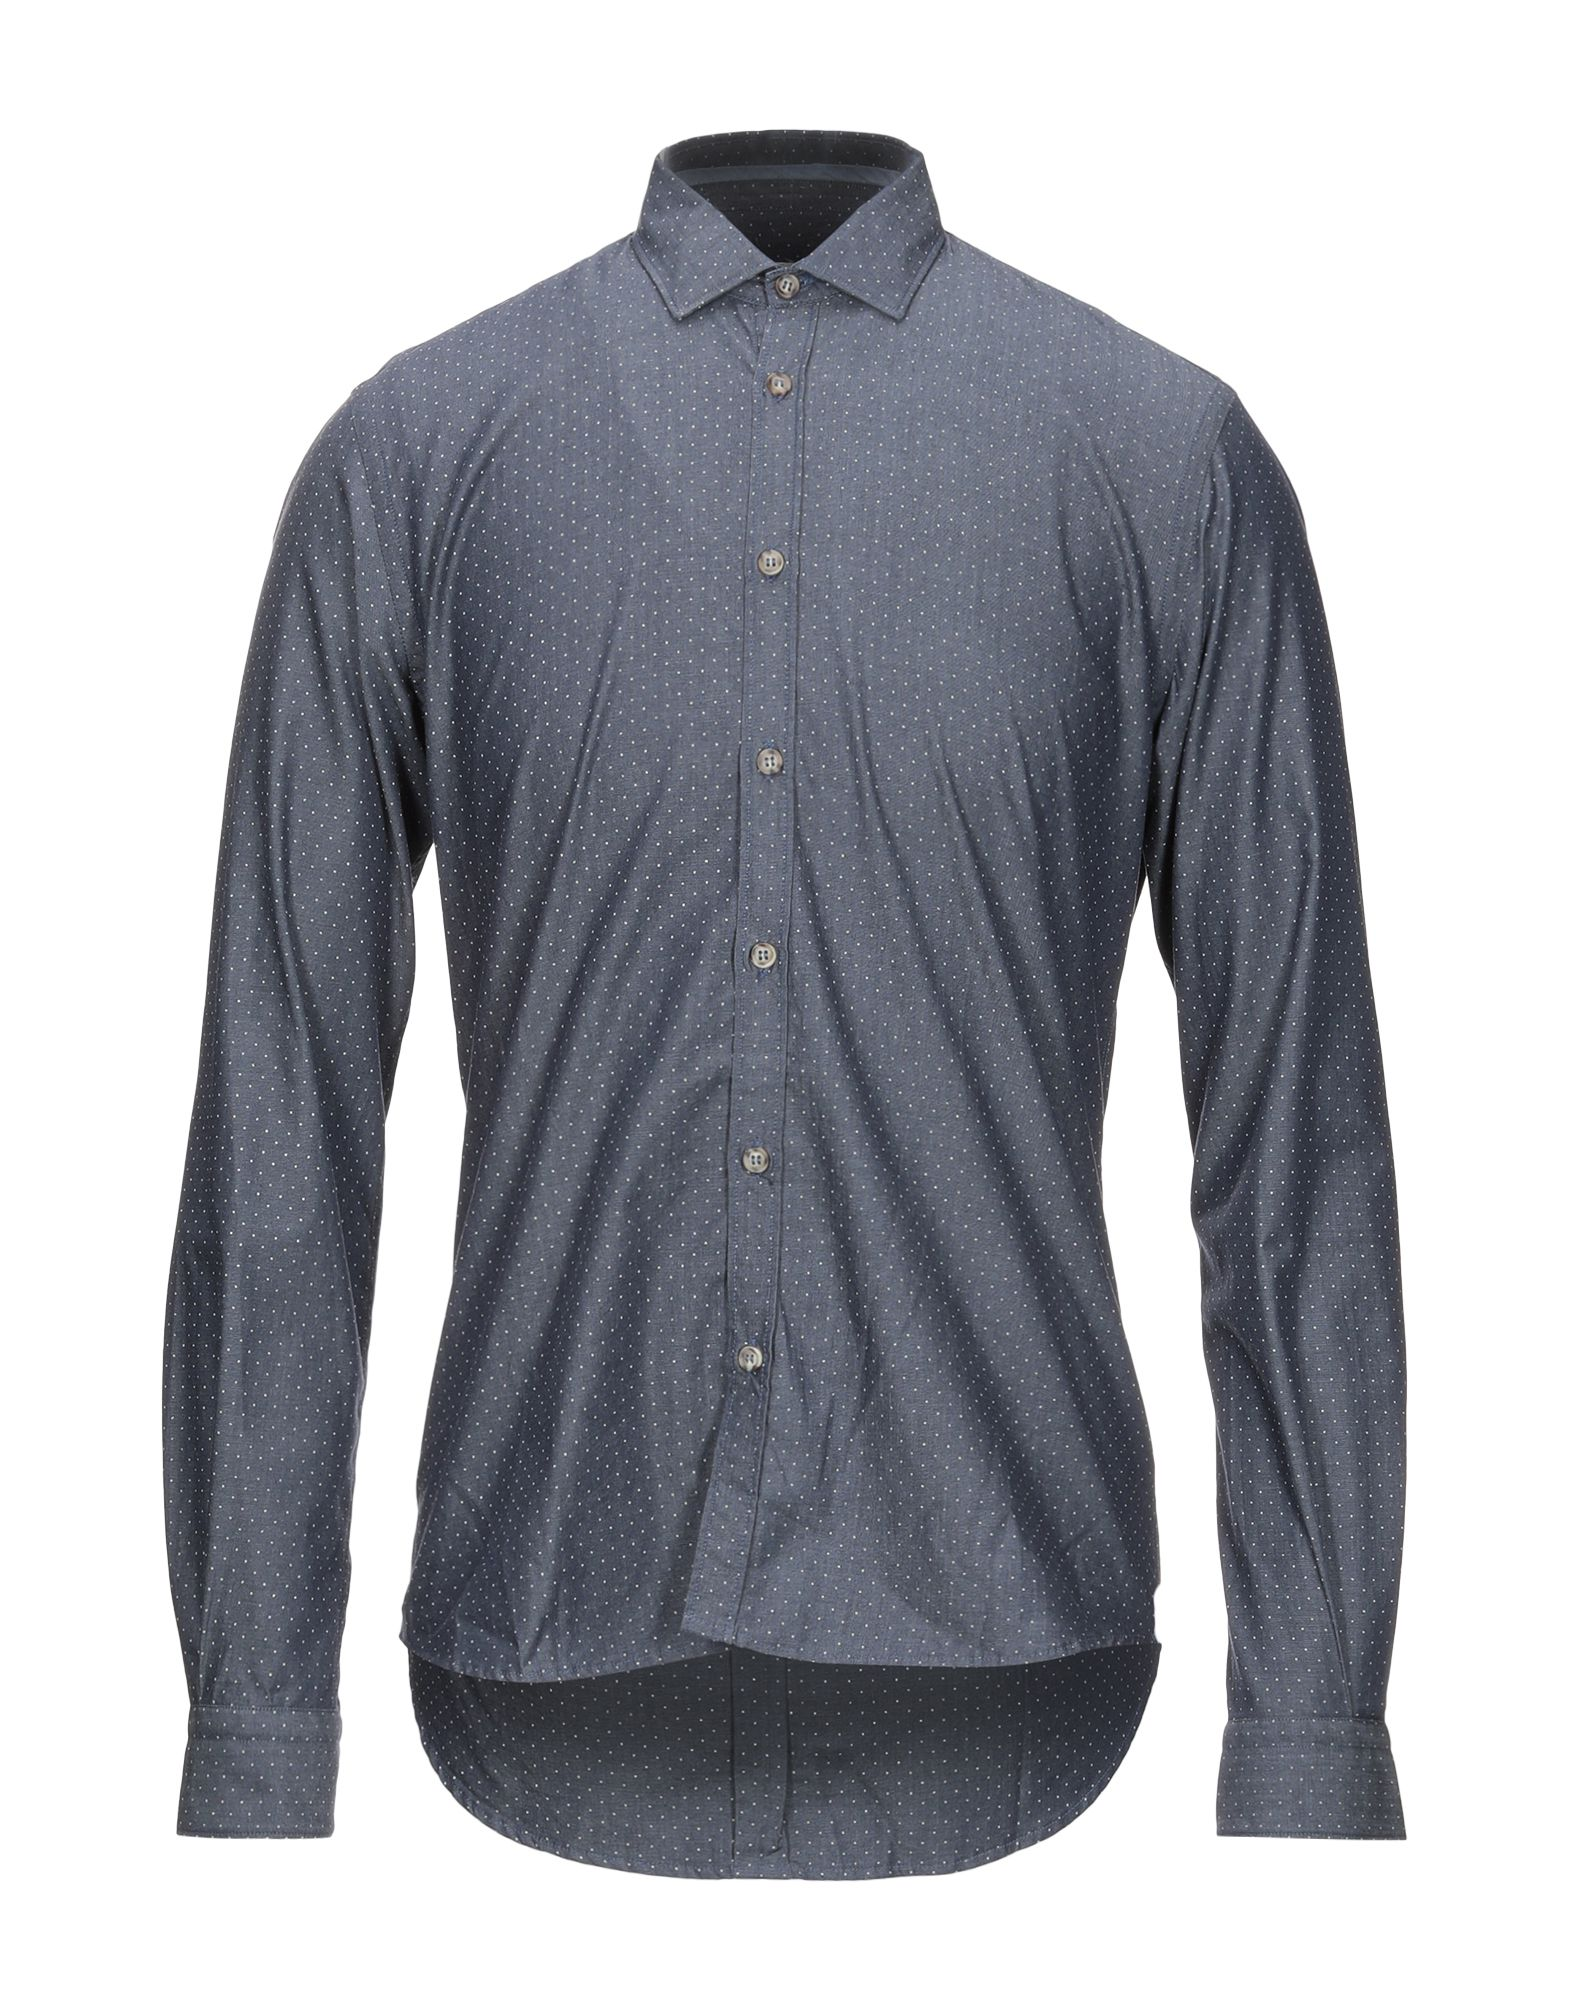 ALLEY DOCKS 963 Джинсовая рубашка oriel 963